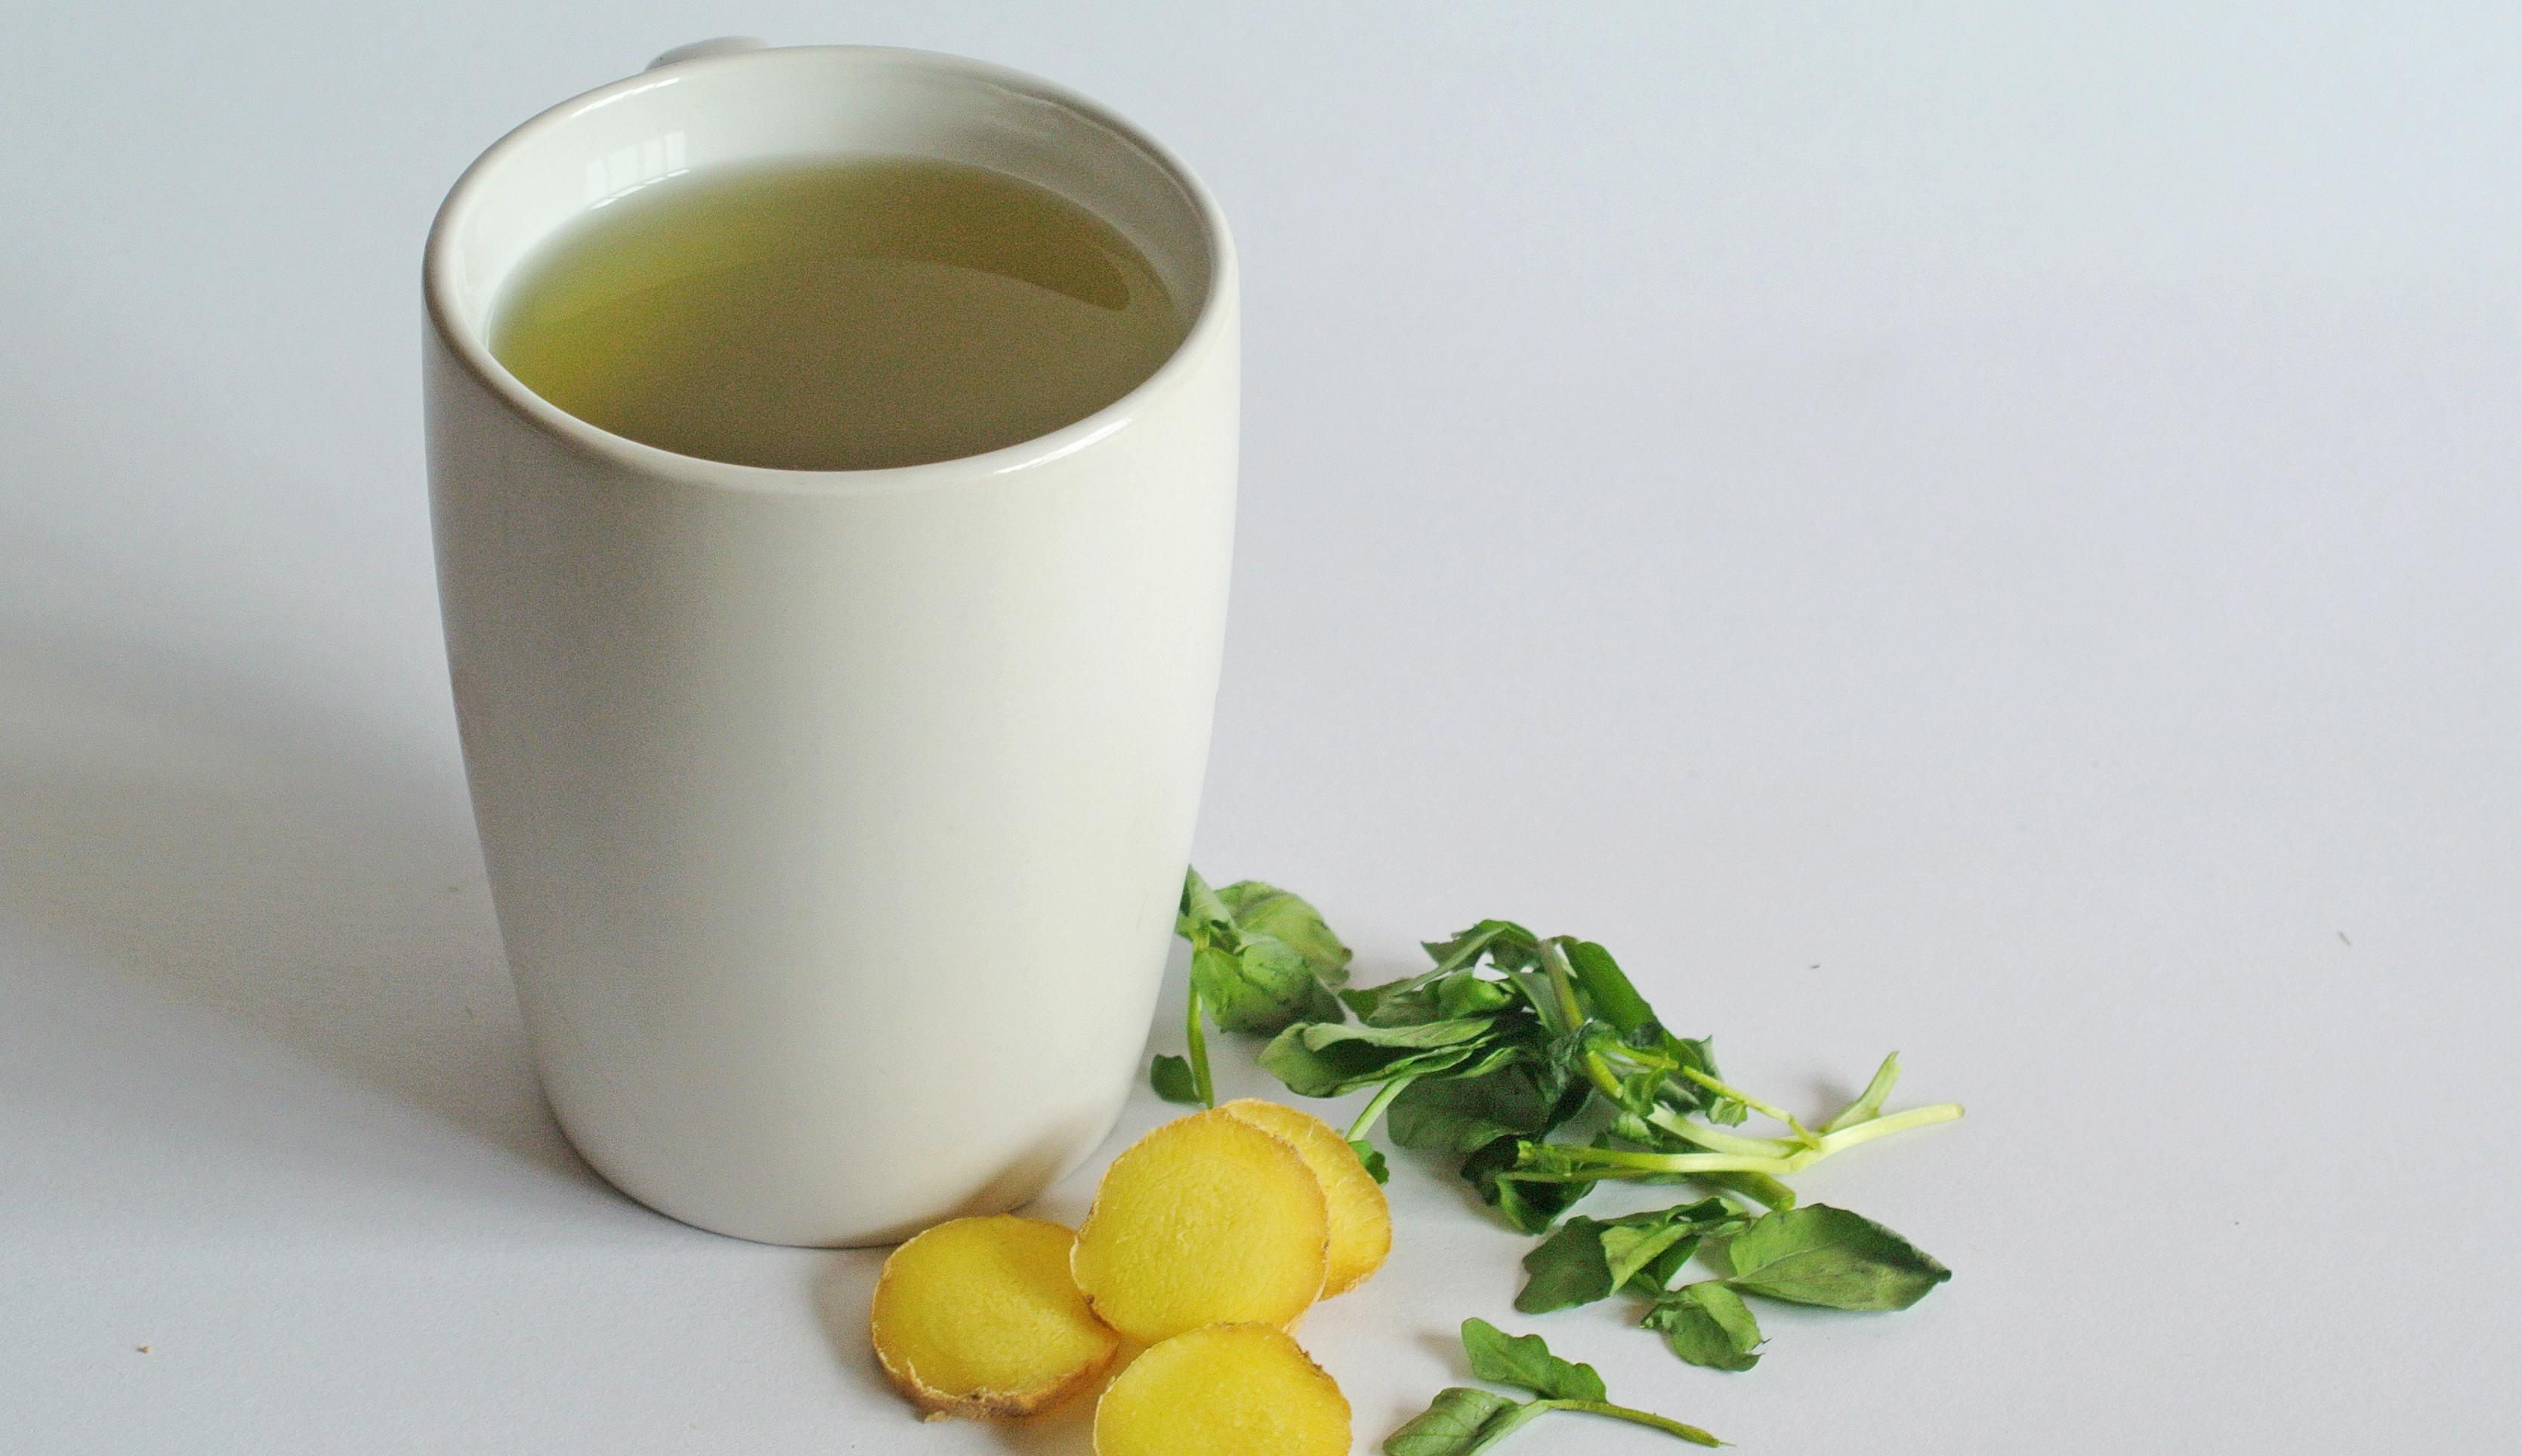 watercress-tea-helps-boost-immunity